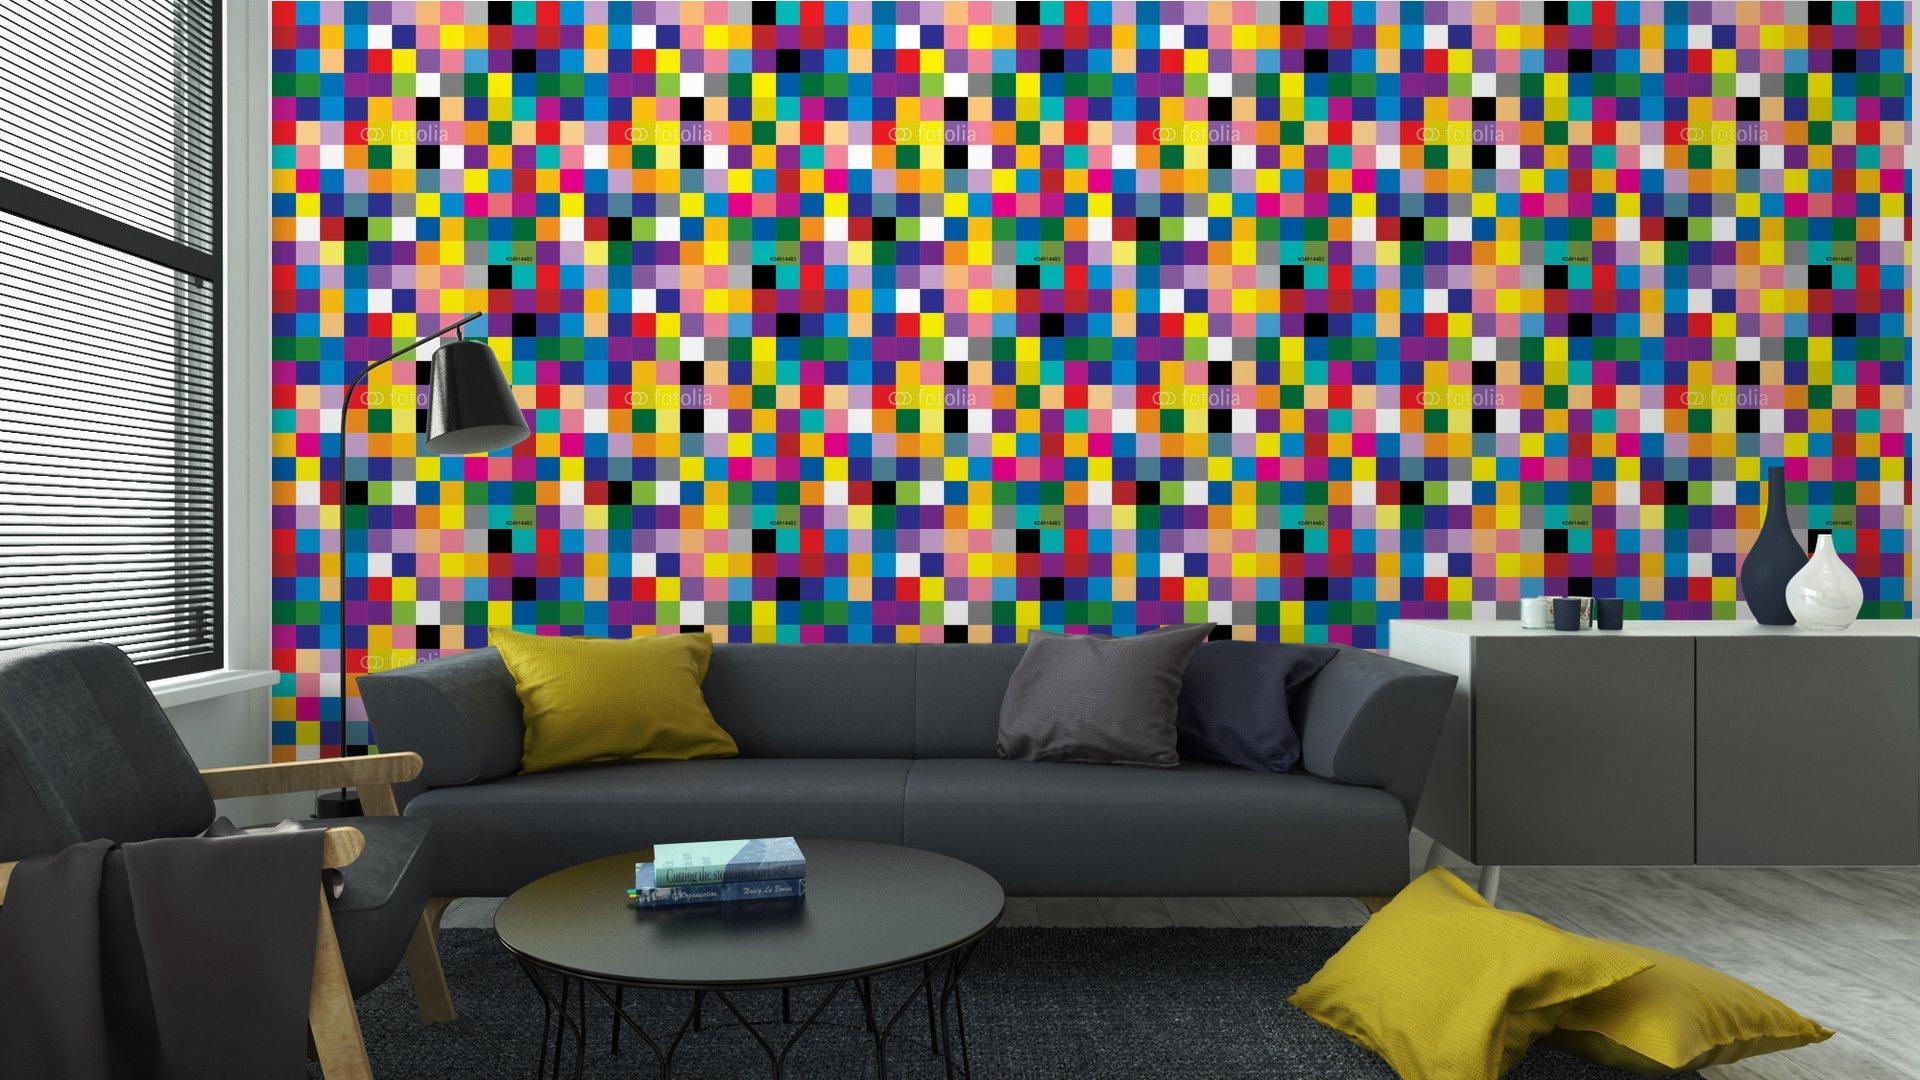 Fotomurales mexico papeles pintados abstracto cuadrado 6 - PapelTapizAbstracto Cuadros de Colores 01